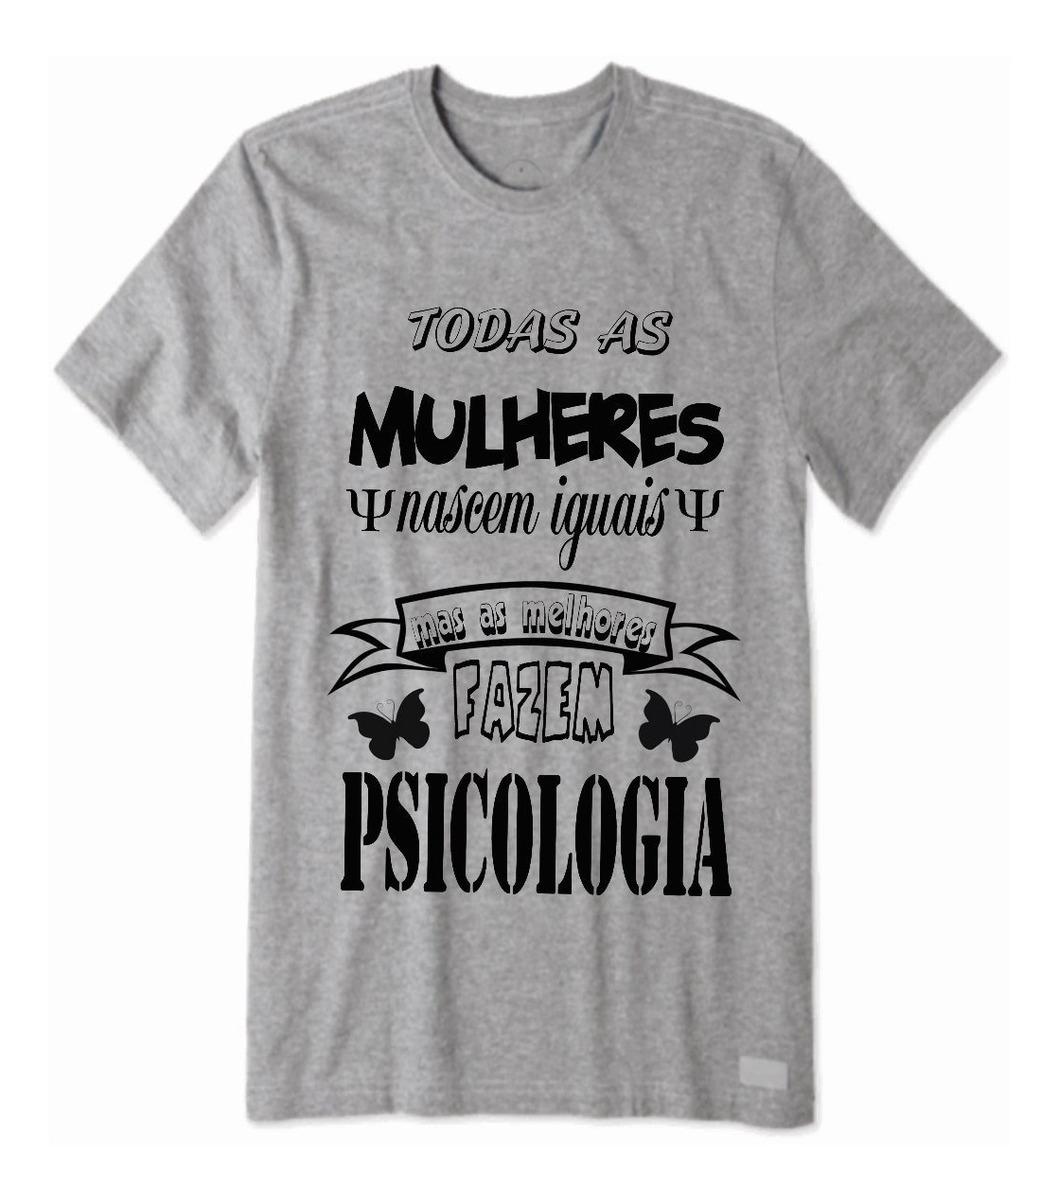 Camiseta Psicologia Formatura Graduação Frases Psique P10